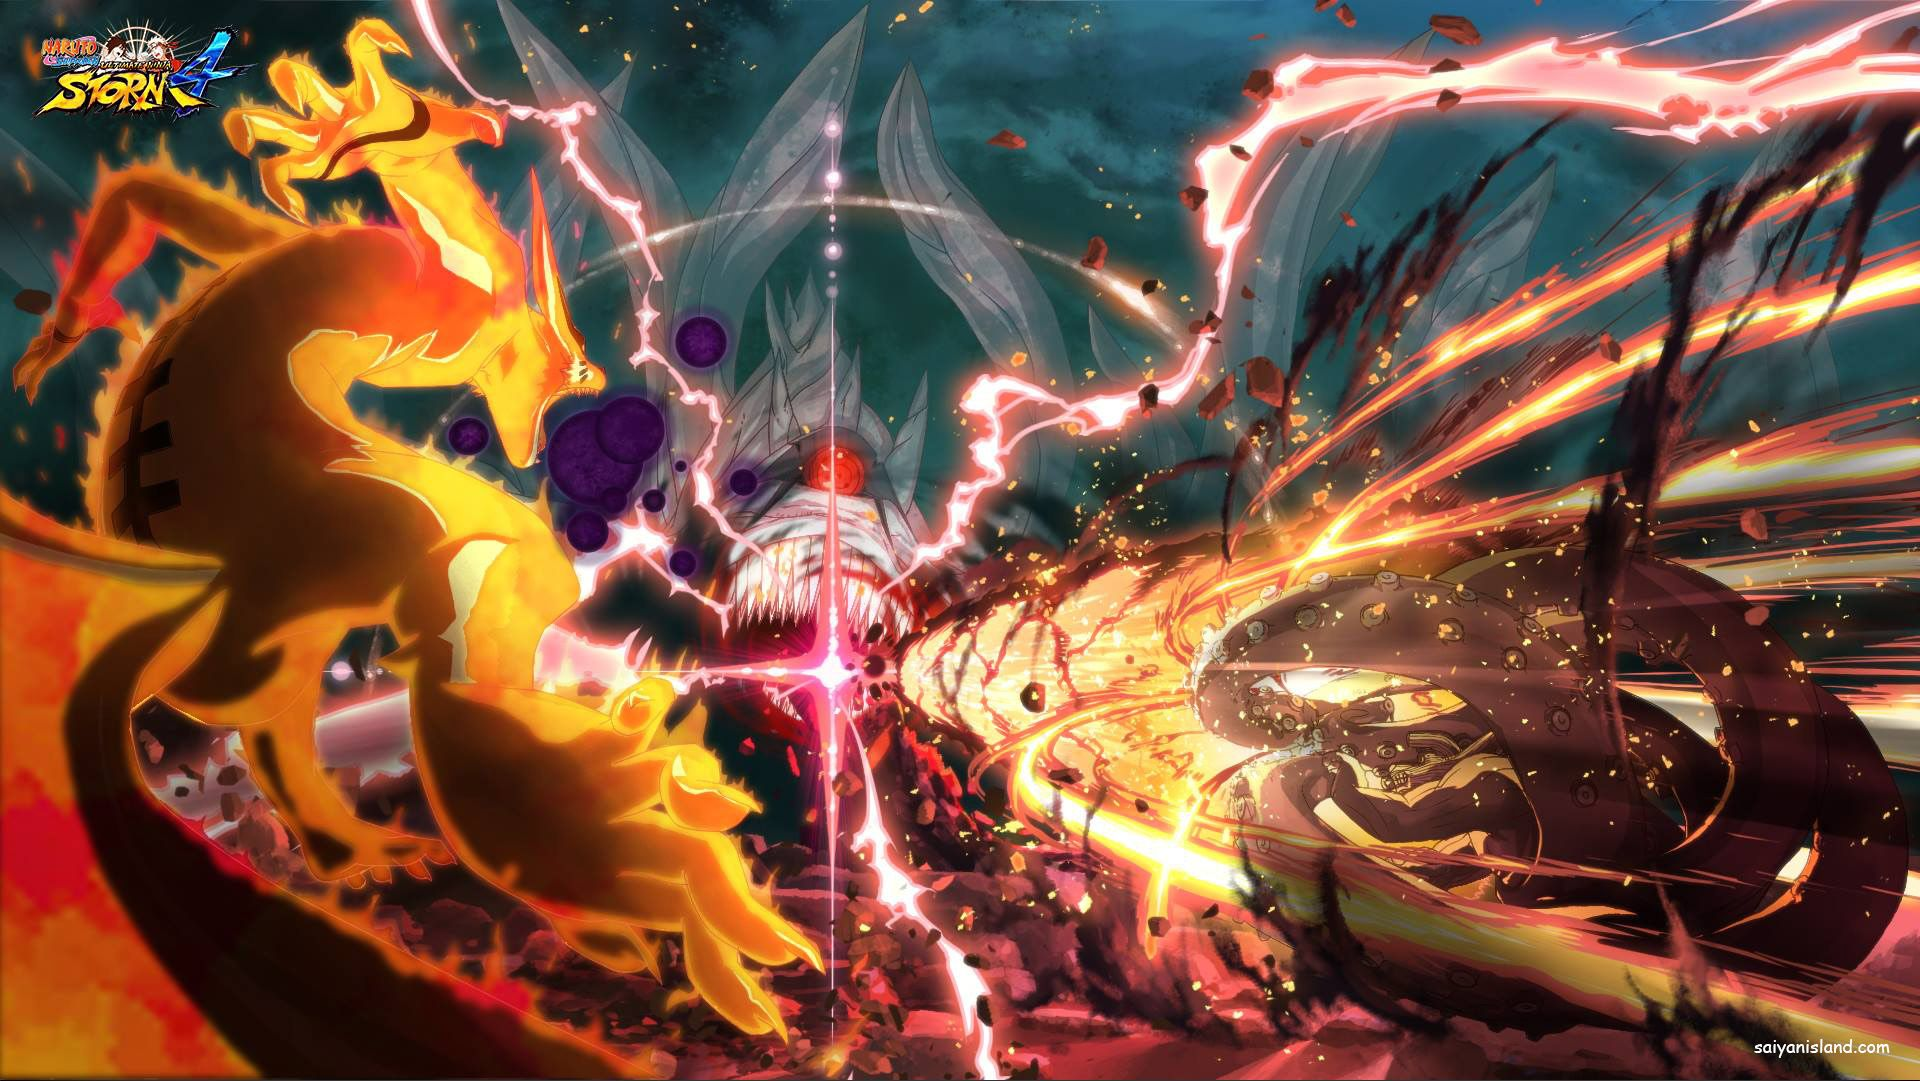 Naruto Storm 4 Eight, Nine Tails vs Ten Tails Art